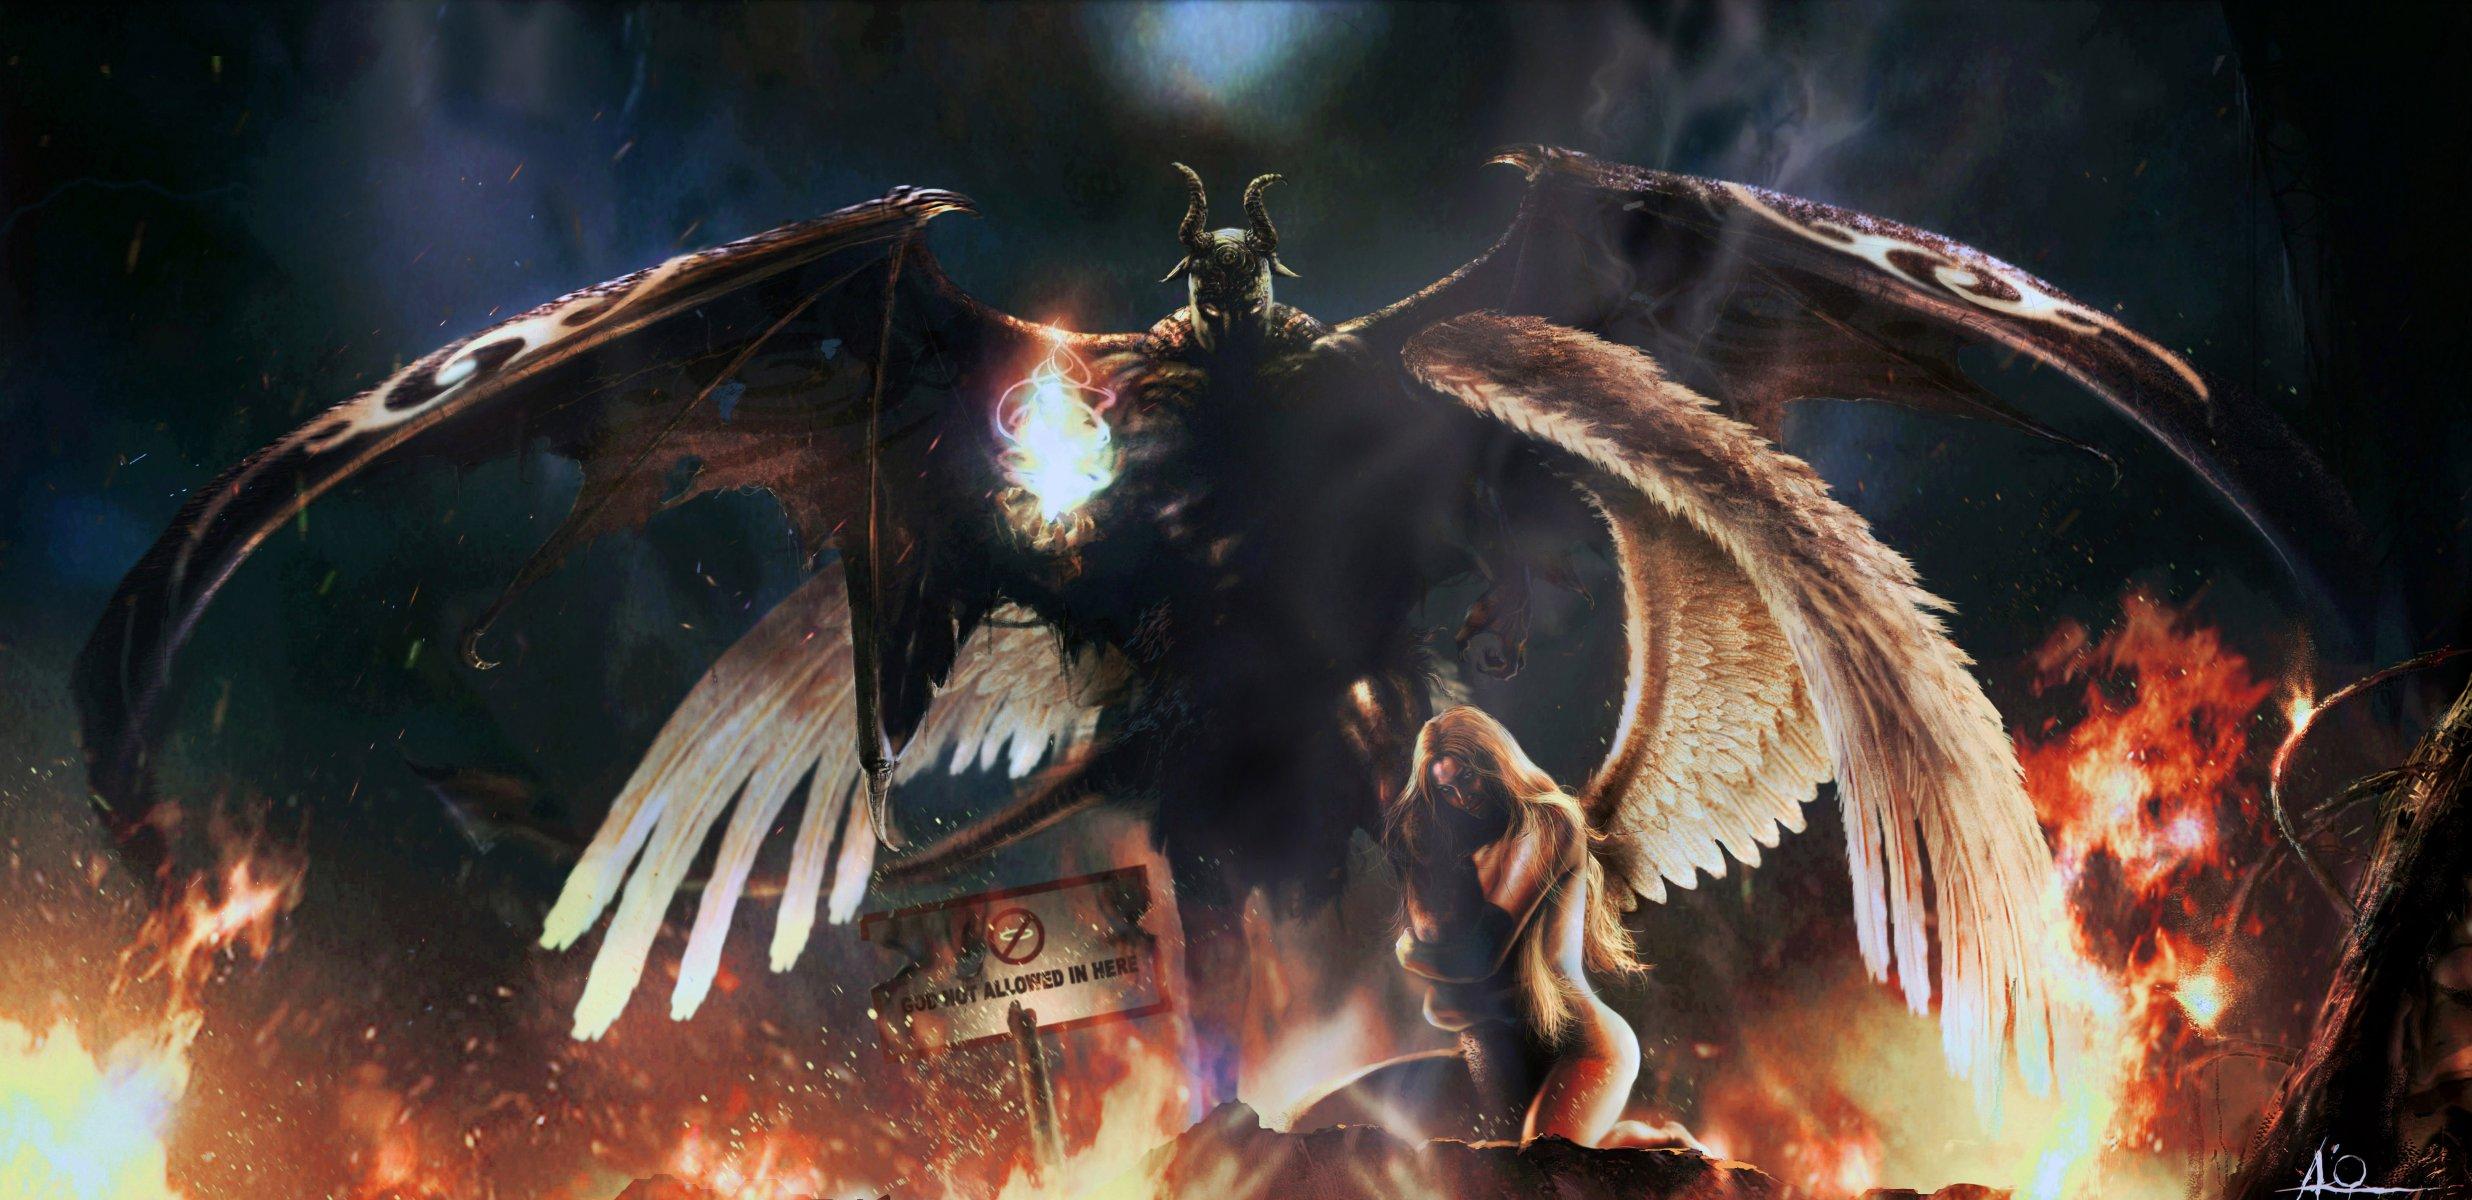 Обои Фантастика, падший ангел, крылья. Фантастика foto 15